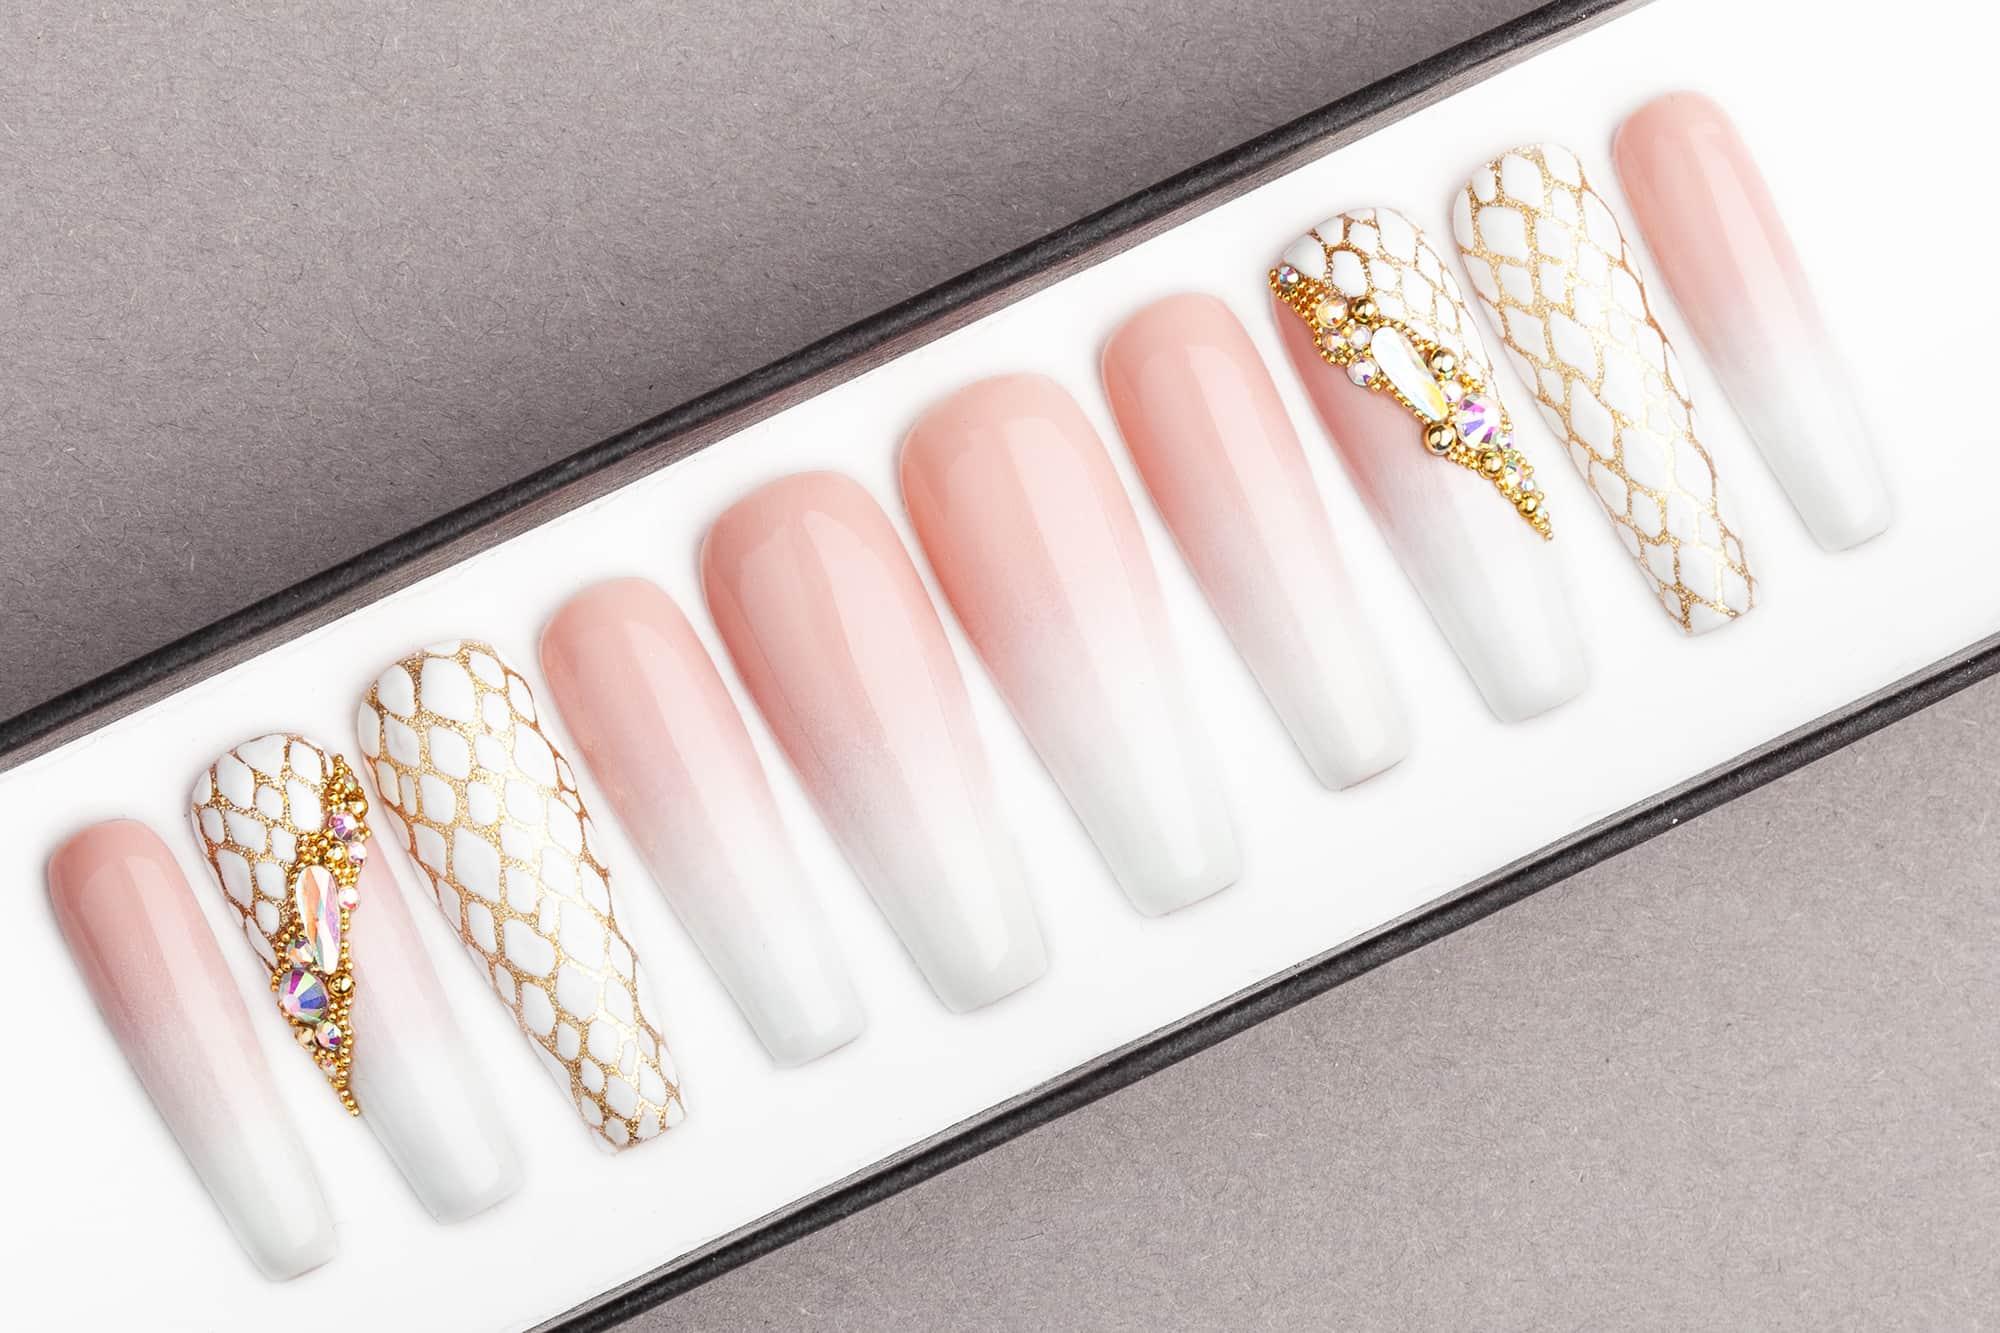 Almond Baby Boomer Nails - nail decorations